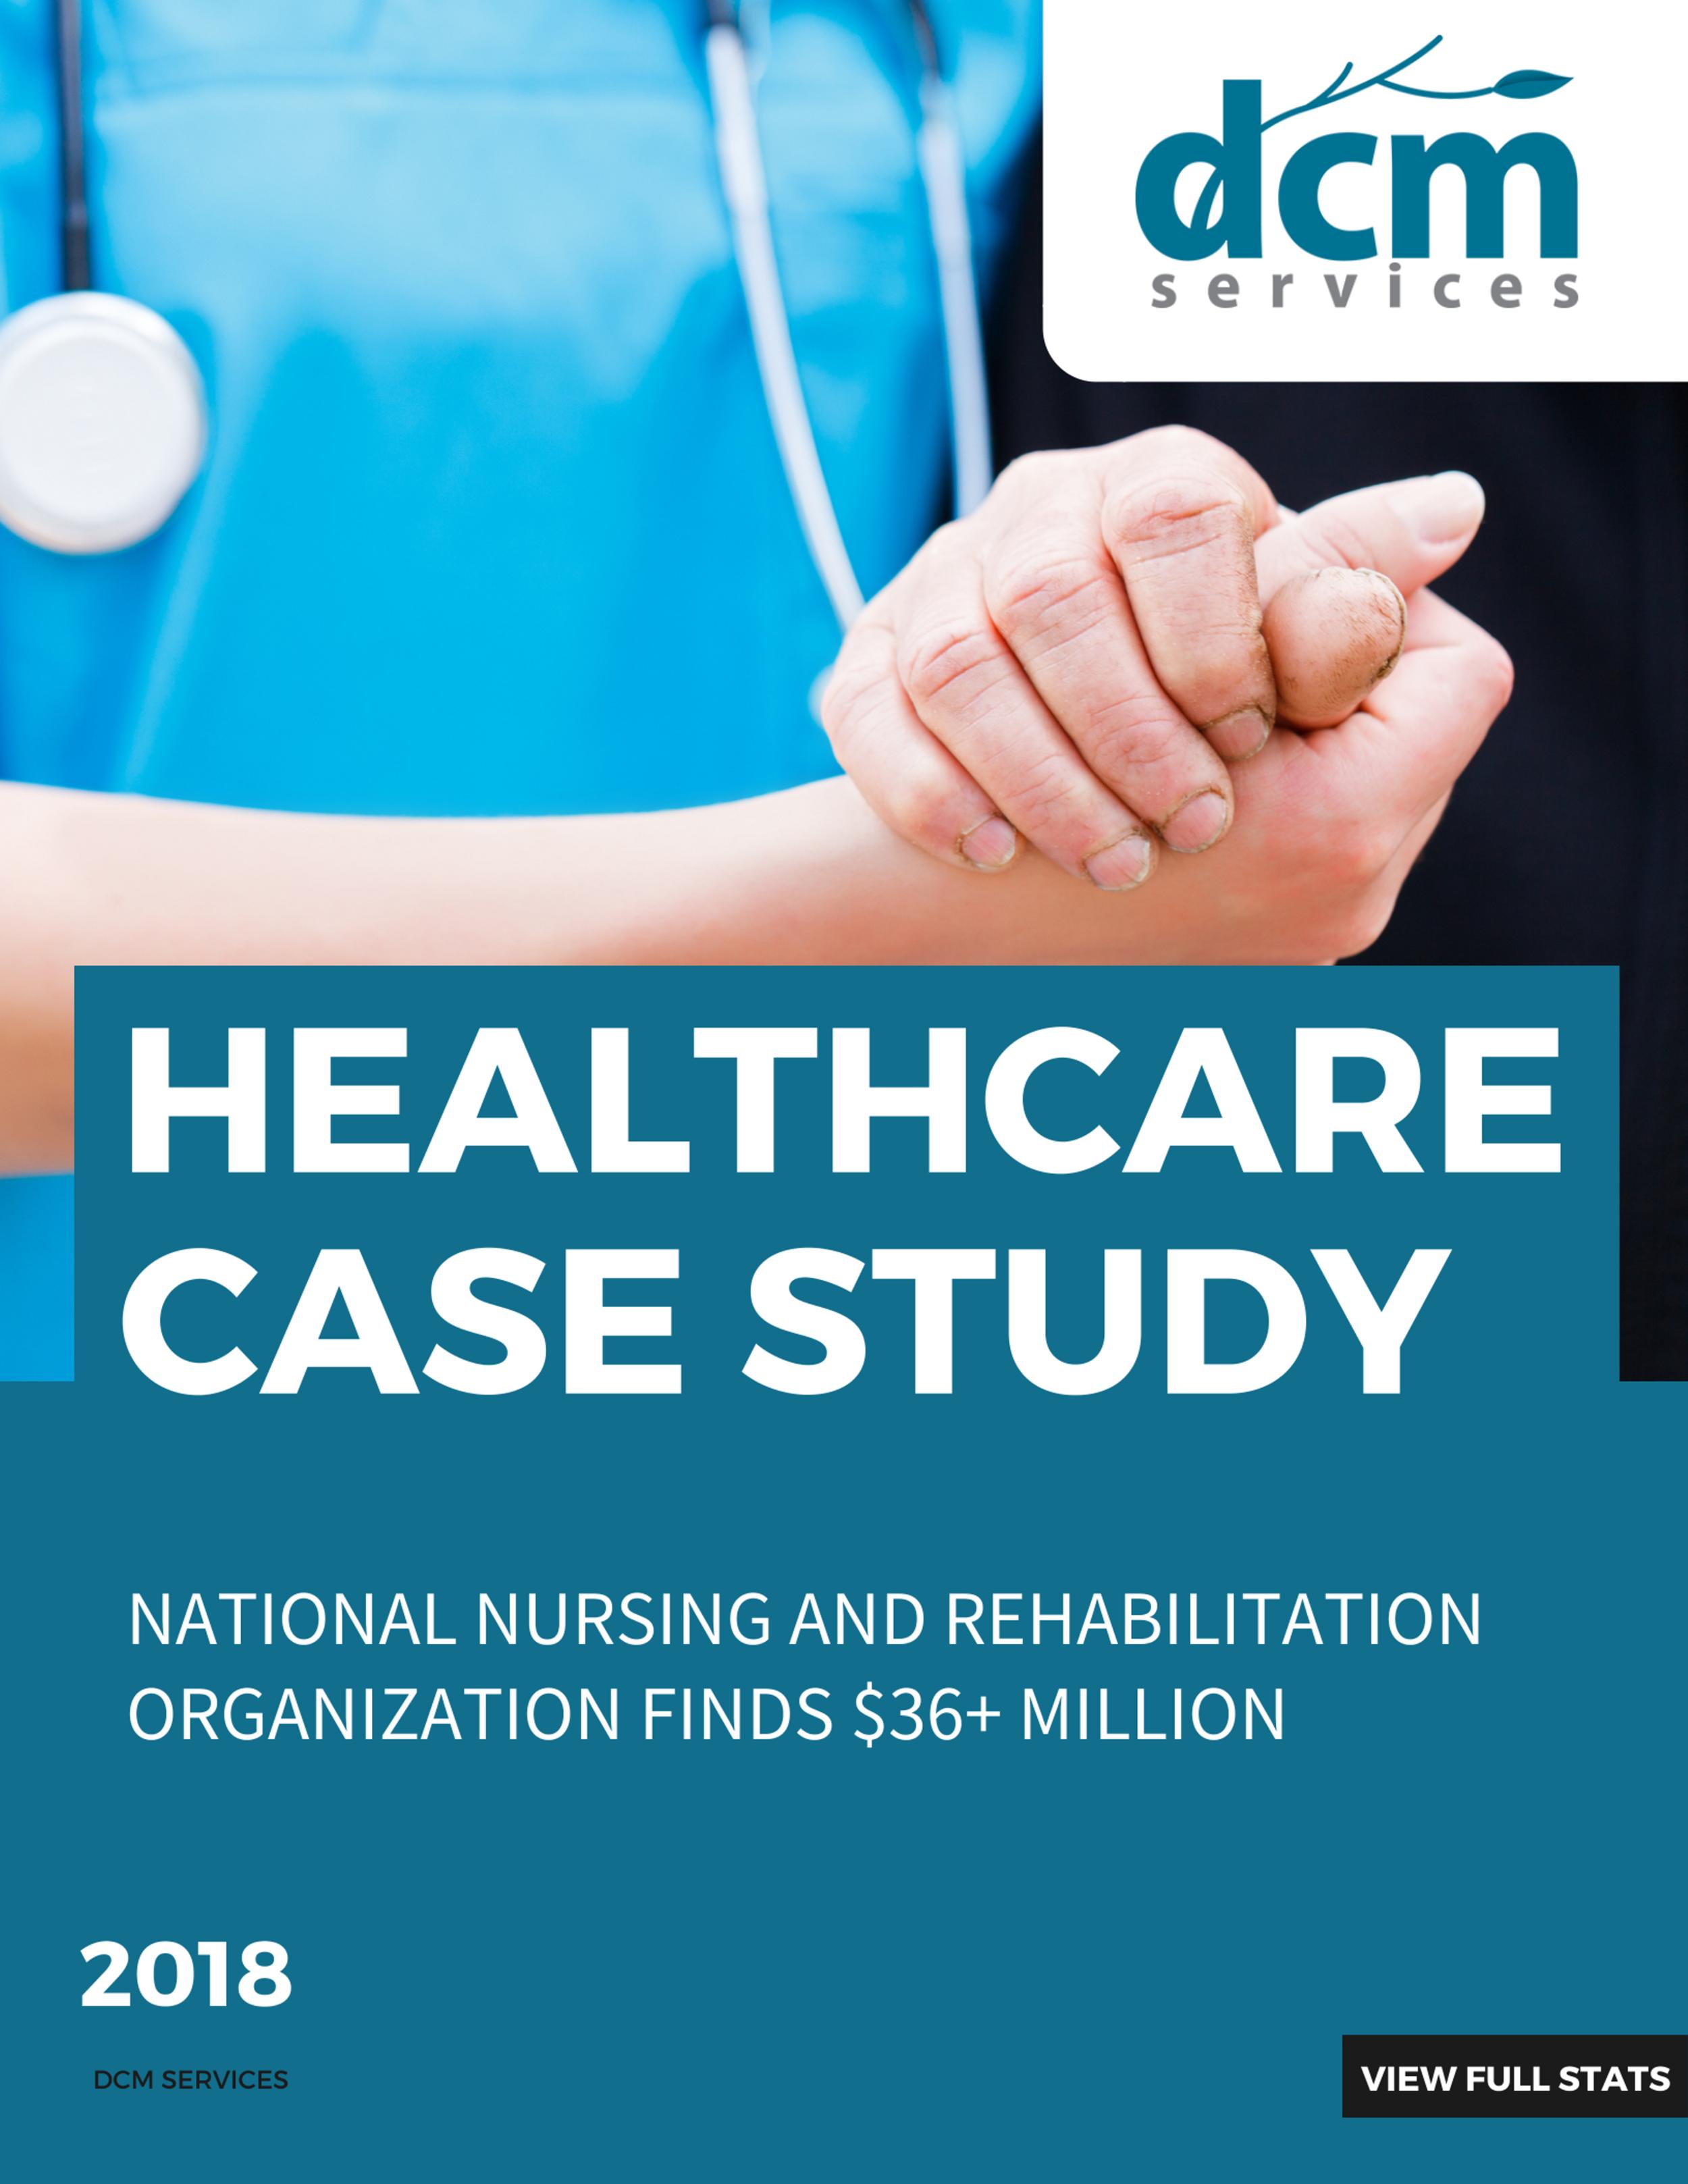 National nursing and rehabilitation organization finds $36+ million    Read more